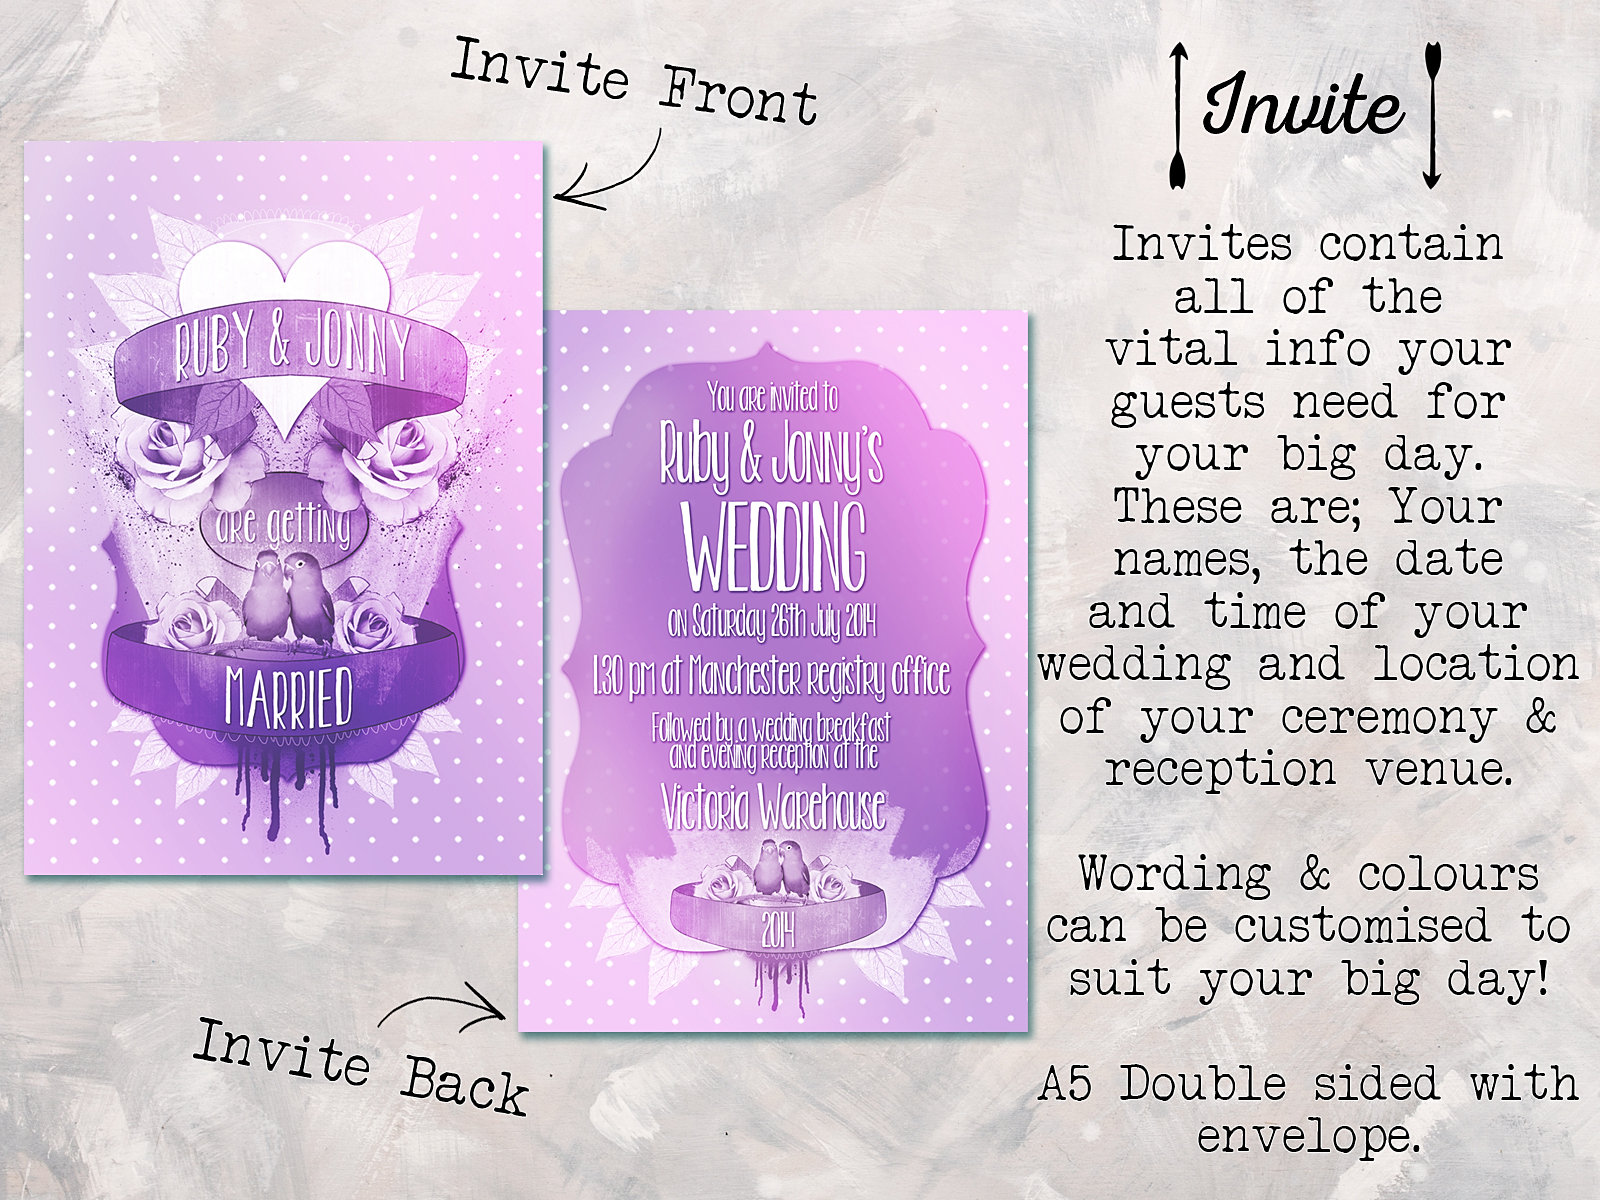 Wedding Invites Unique with awesome invitation sample